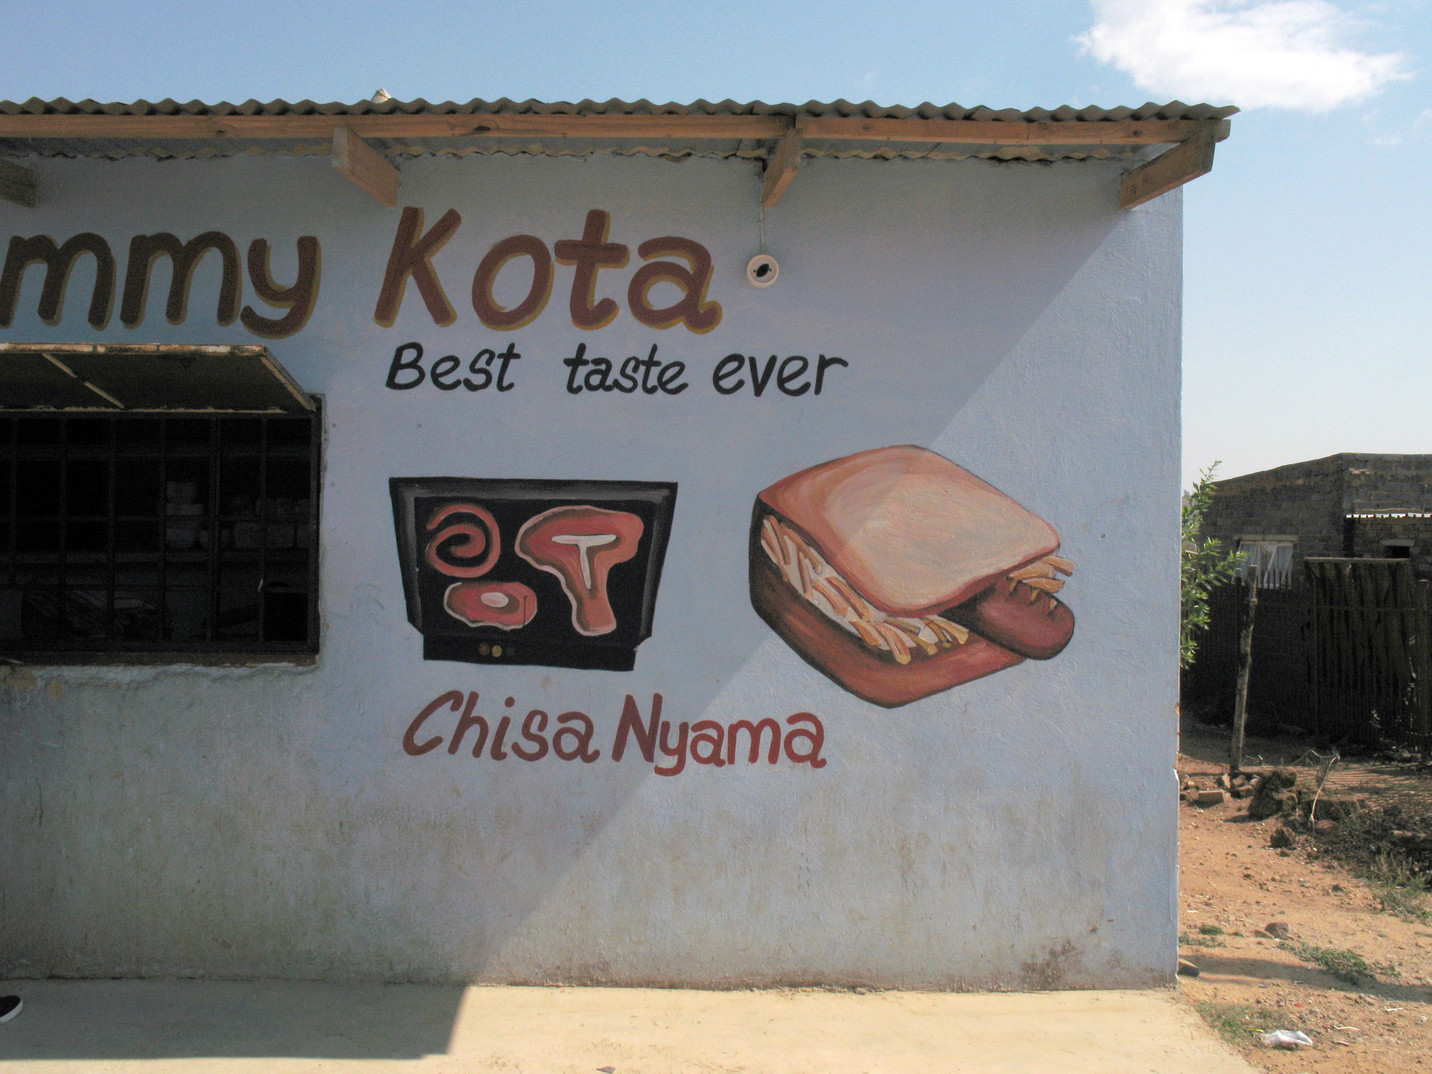 Jimmy Kota Best taste ever, Cosmo City